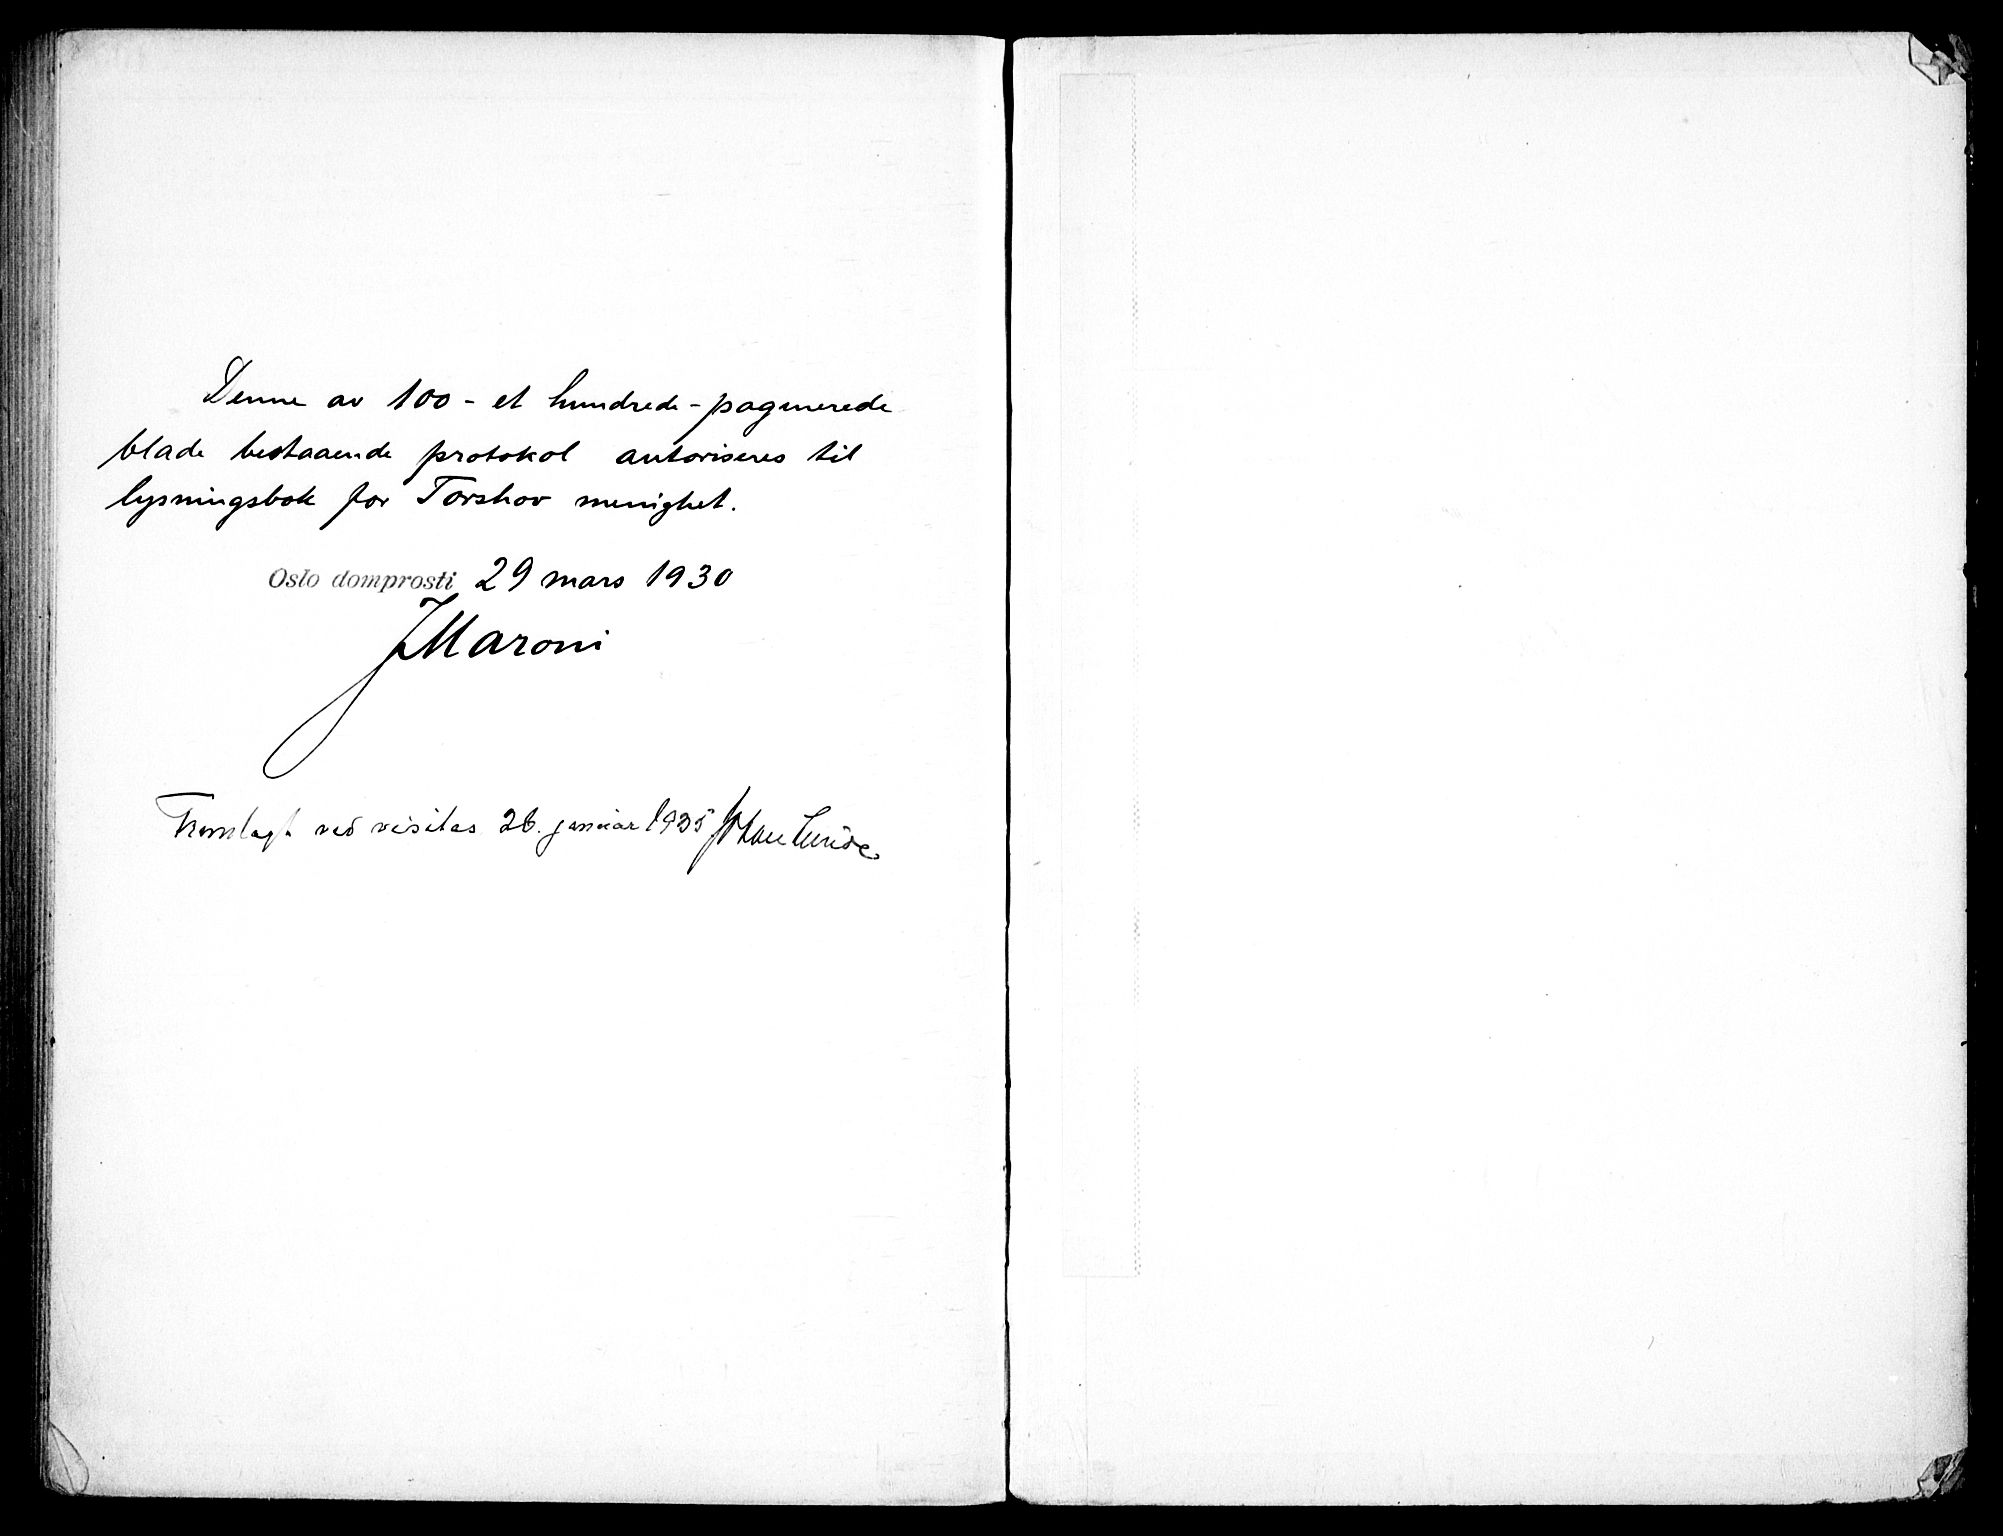 SAO, Torshov prestekontor Kirkebøker, H/Ha/L0001: Lysningsprotokoll nr. 1, 1930-1938